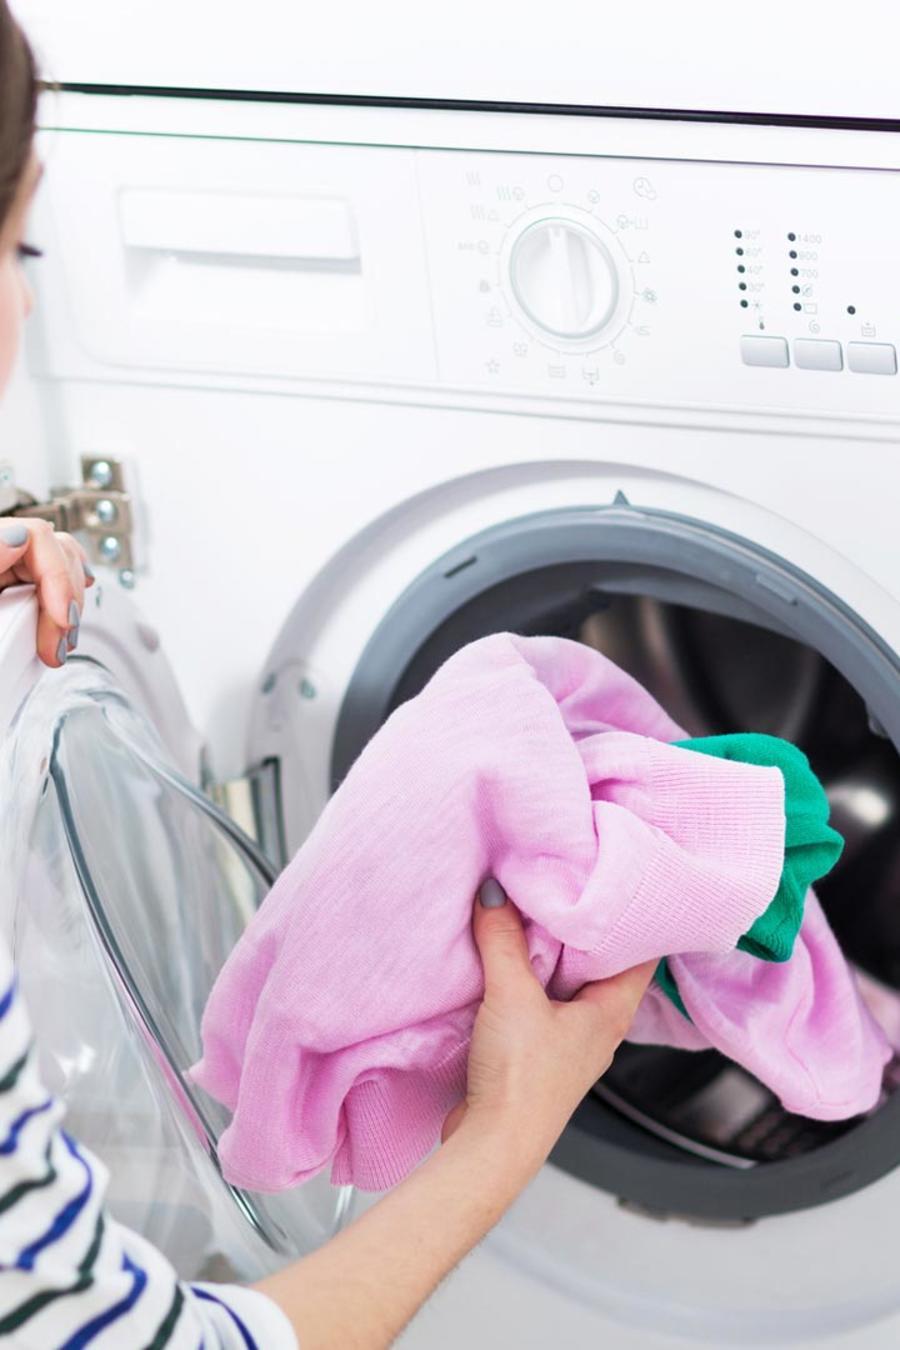 Mujer lavando ropa